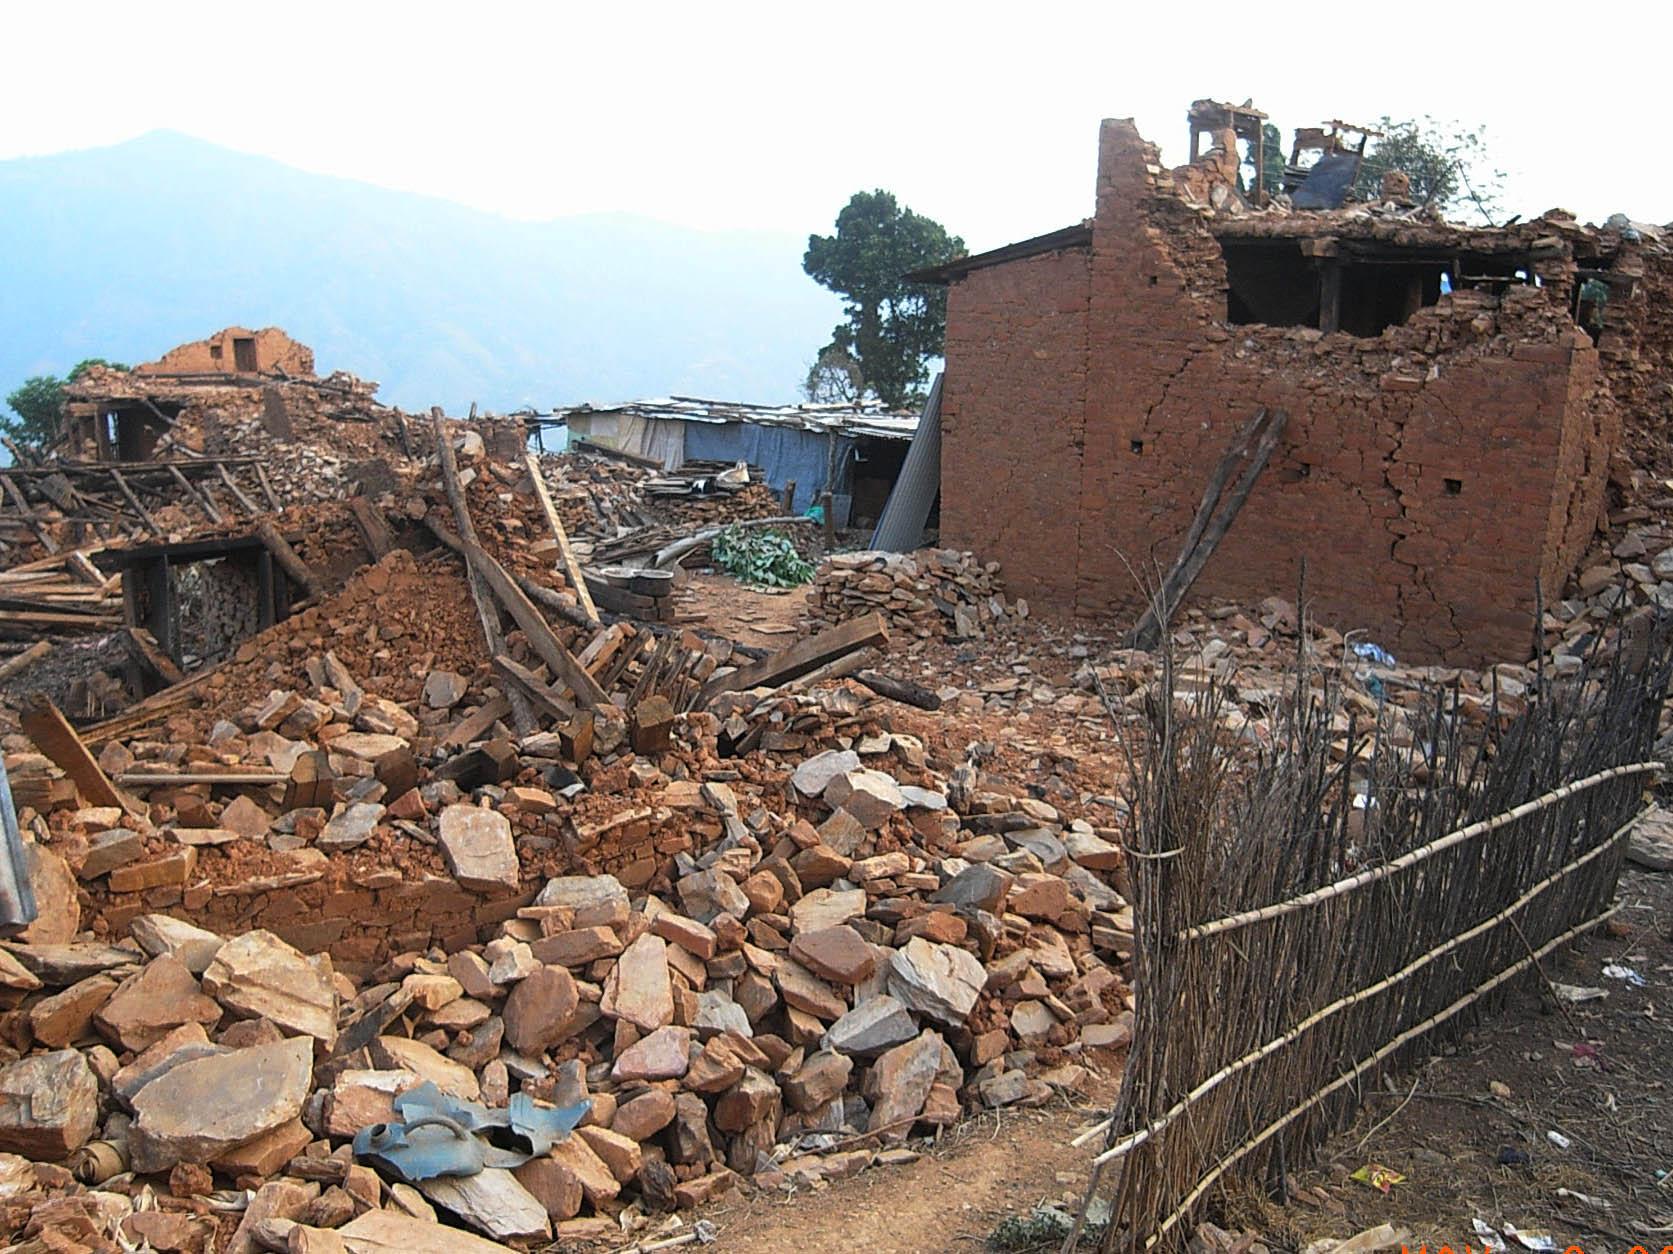 ManjushriProject_59_deserted_village_Bhotesipa_picture_2nd.JPG